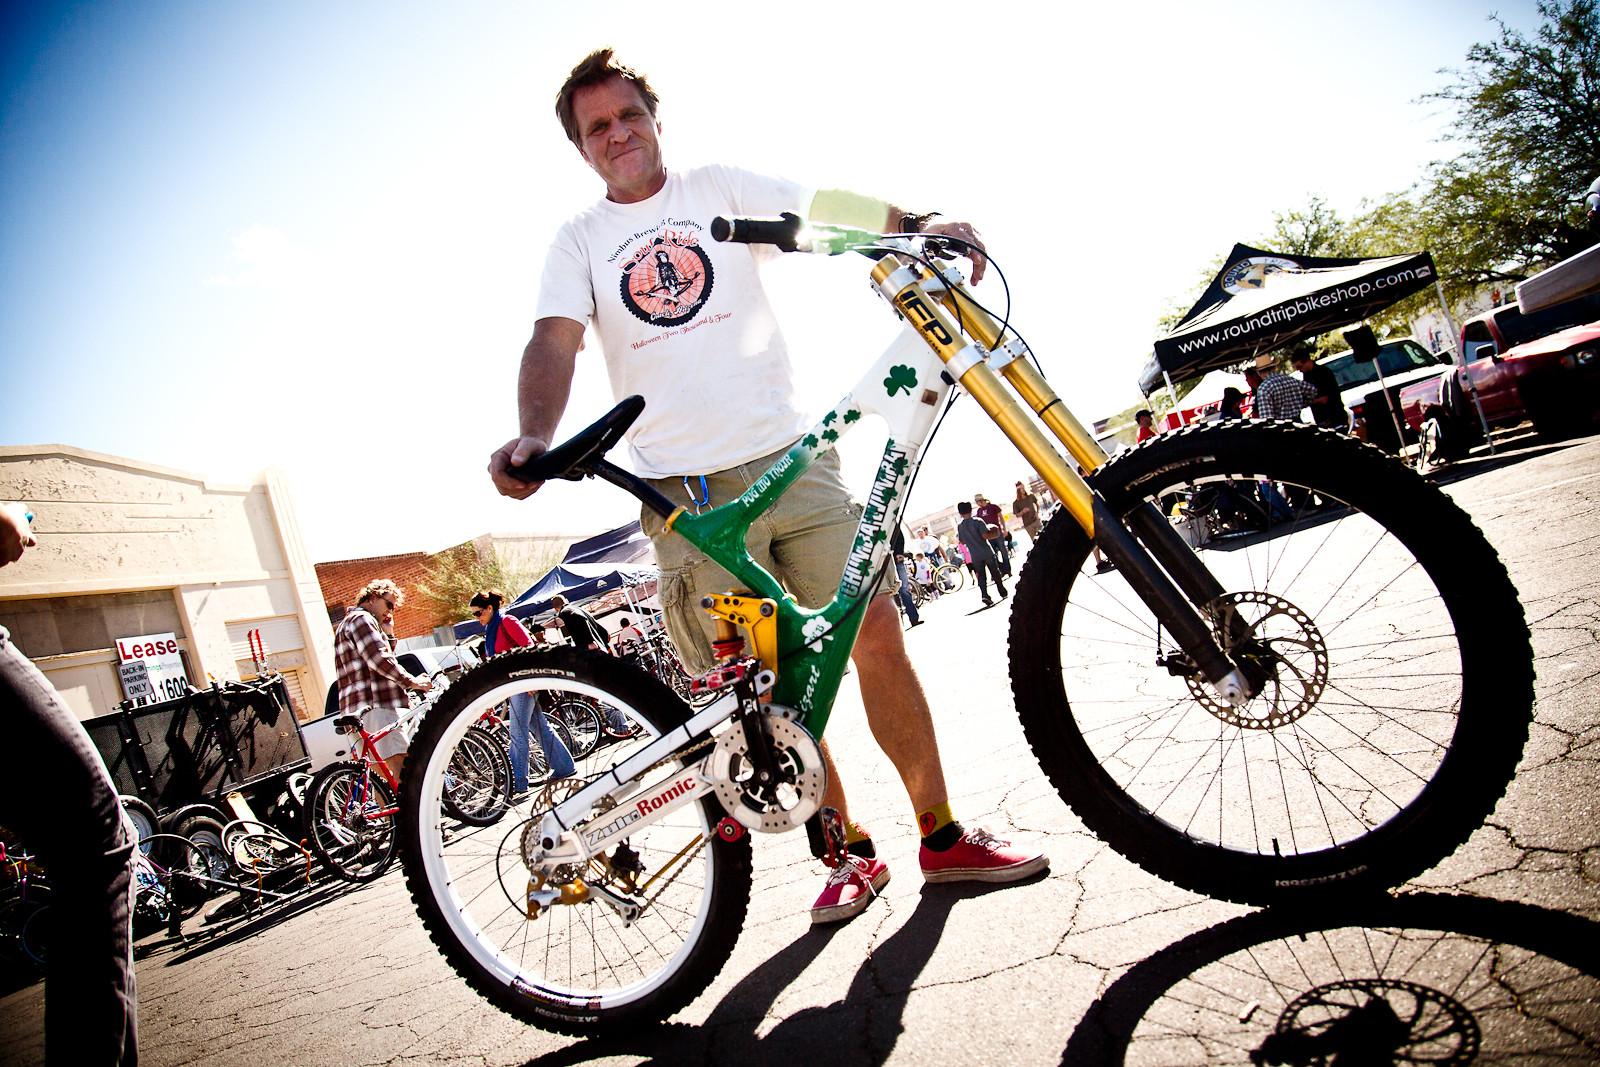 #ThrowbackThursday - Rob Bauer's 2001 Chumba Wumba Zulu - bturman - Mountain Biking Pictures - Vital MTB